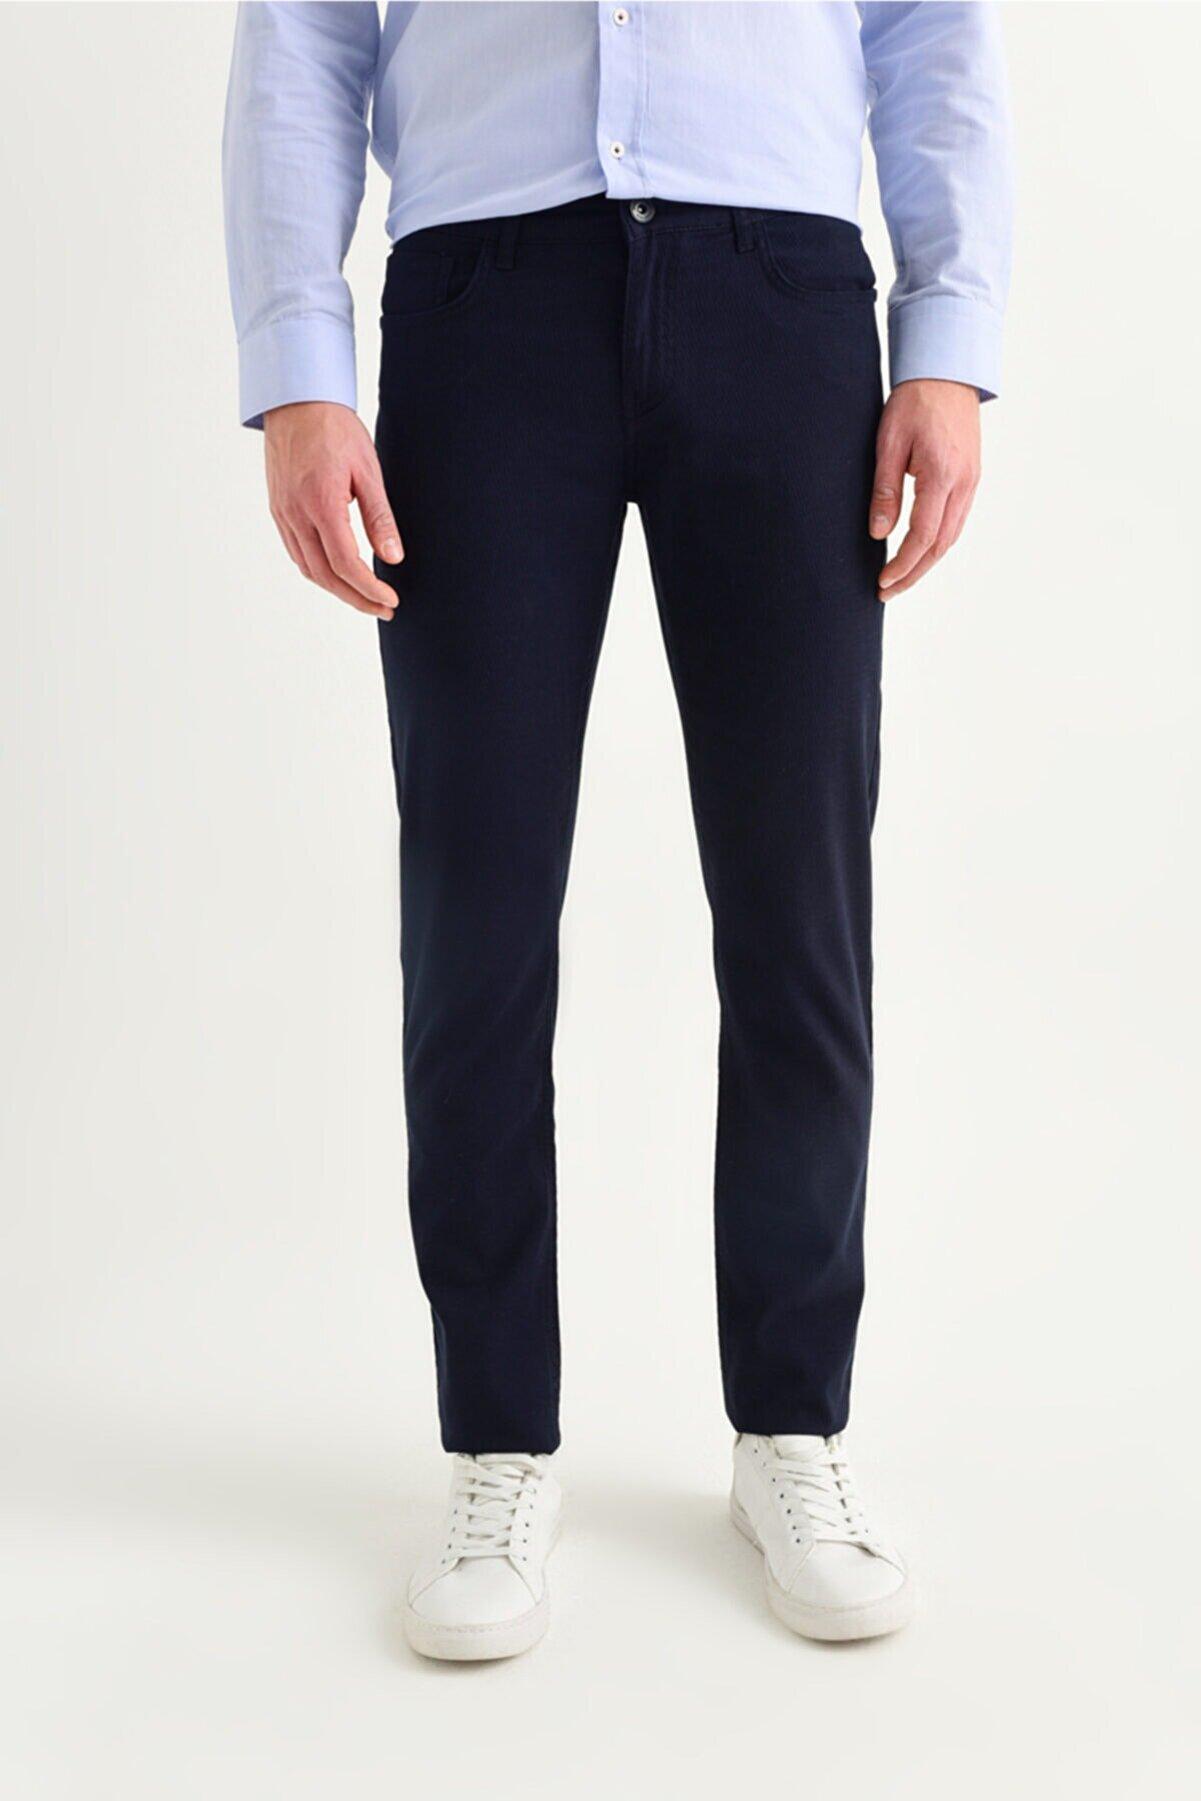 Avva 5 Cepli Armürlü Slim Fit Pantolon